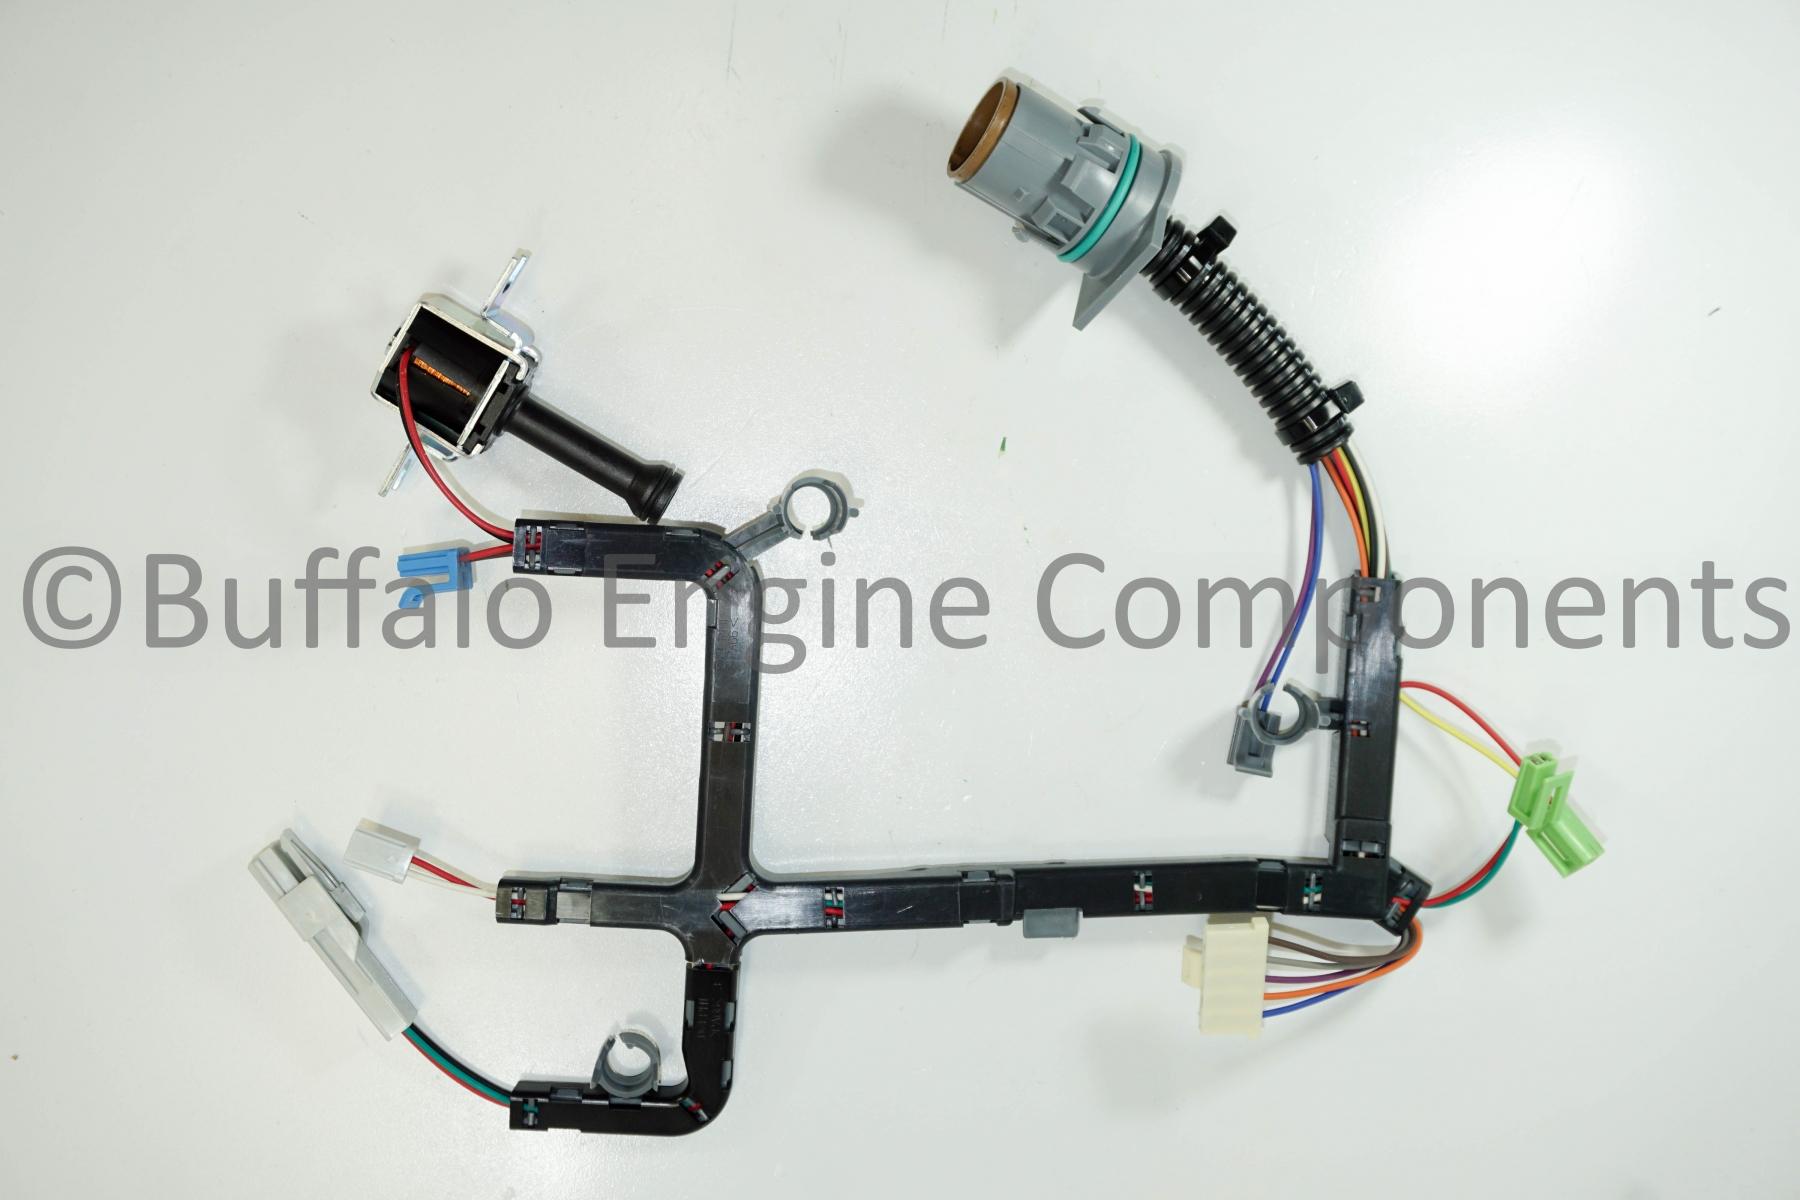 D74425u 4l60e 4l65e Tcc Harness Product Details Wiring